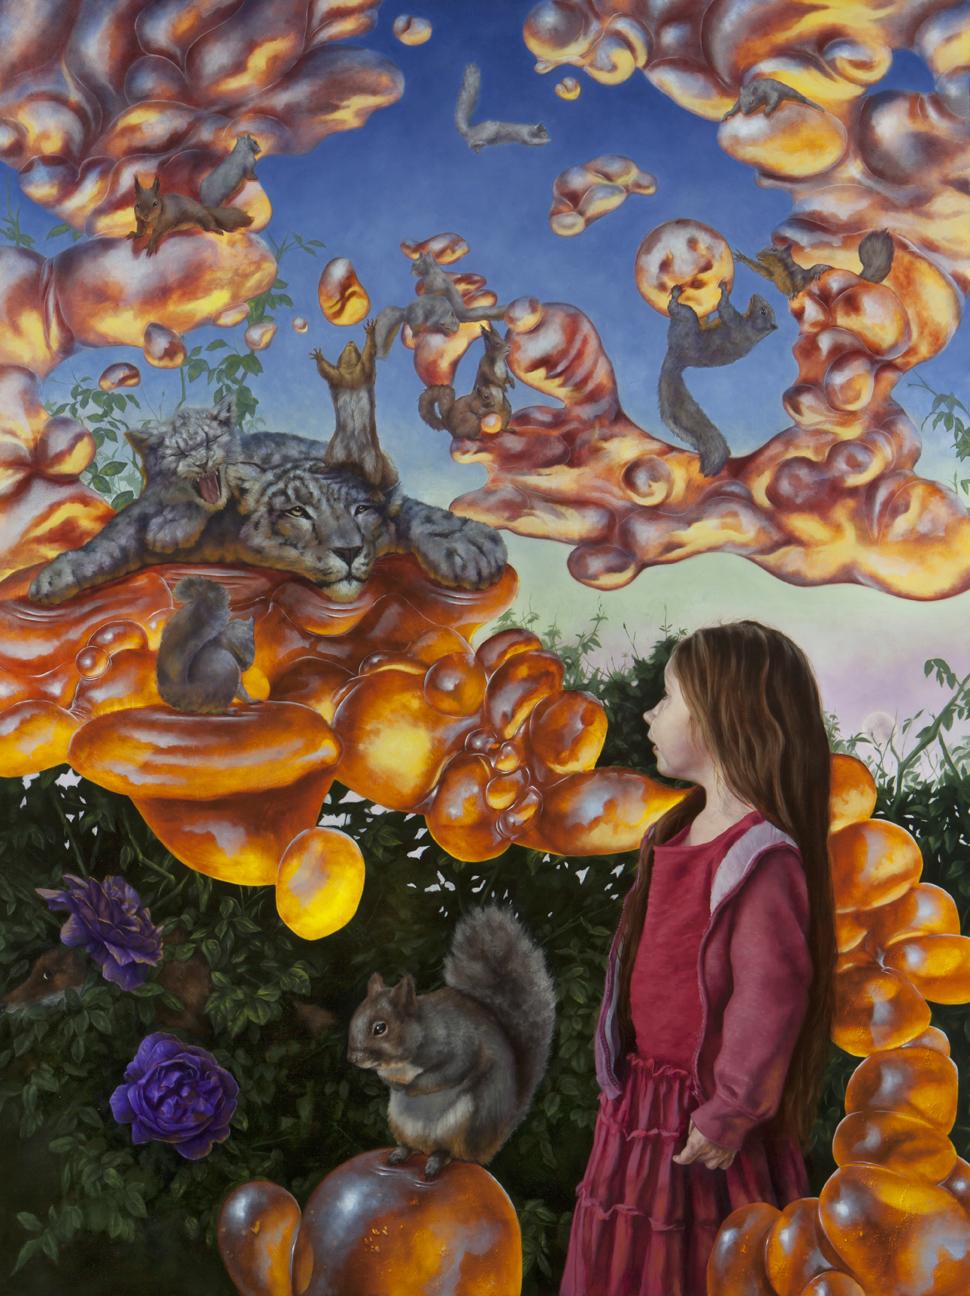 """Wonder"" by Cody Jimenez, Oil on panel, 48in x 36in, 2017 (Cody Jimenez)"